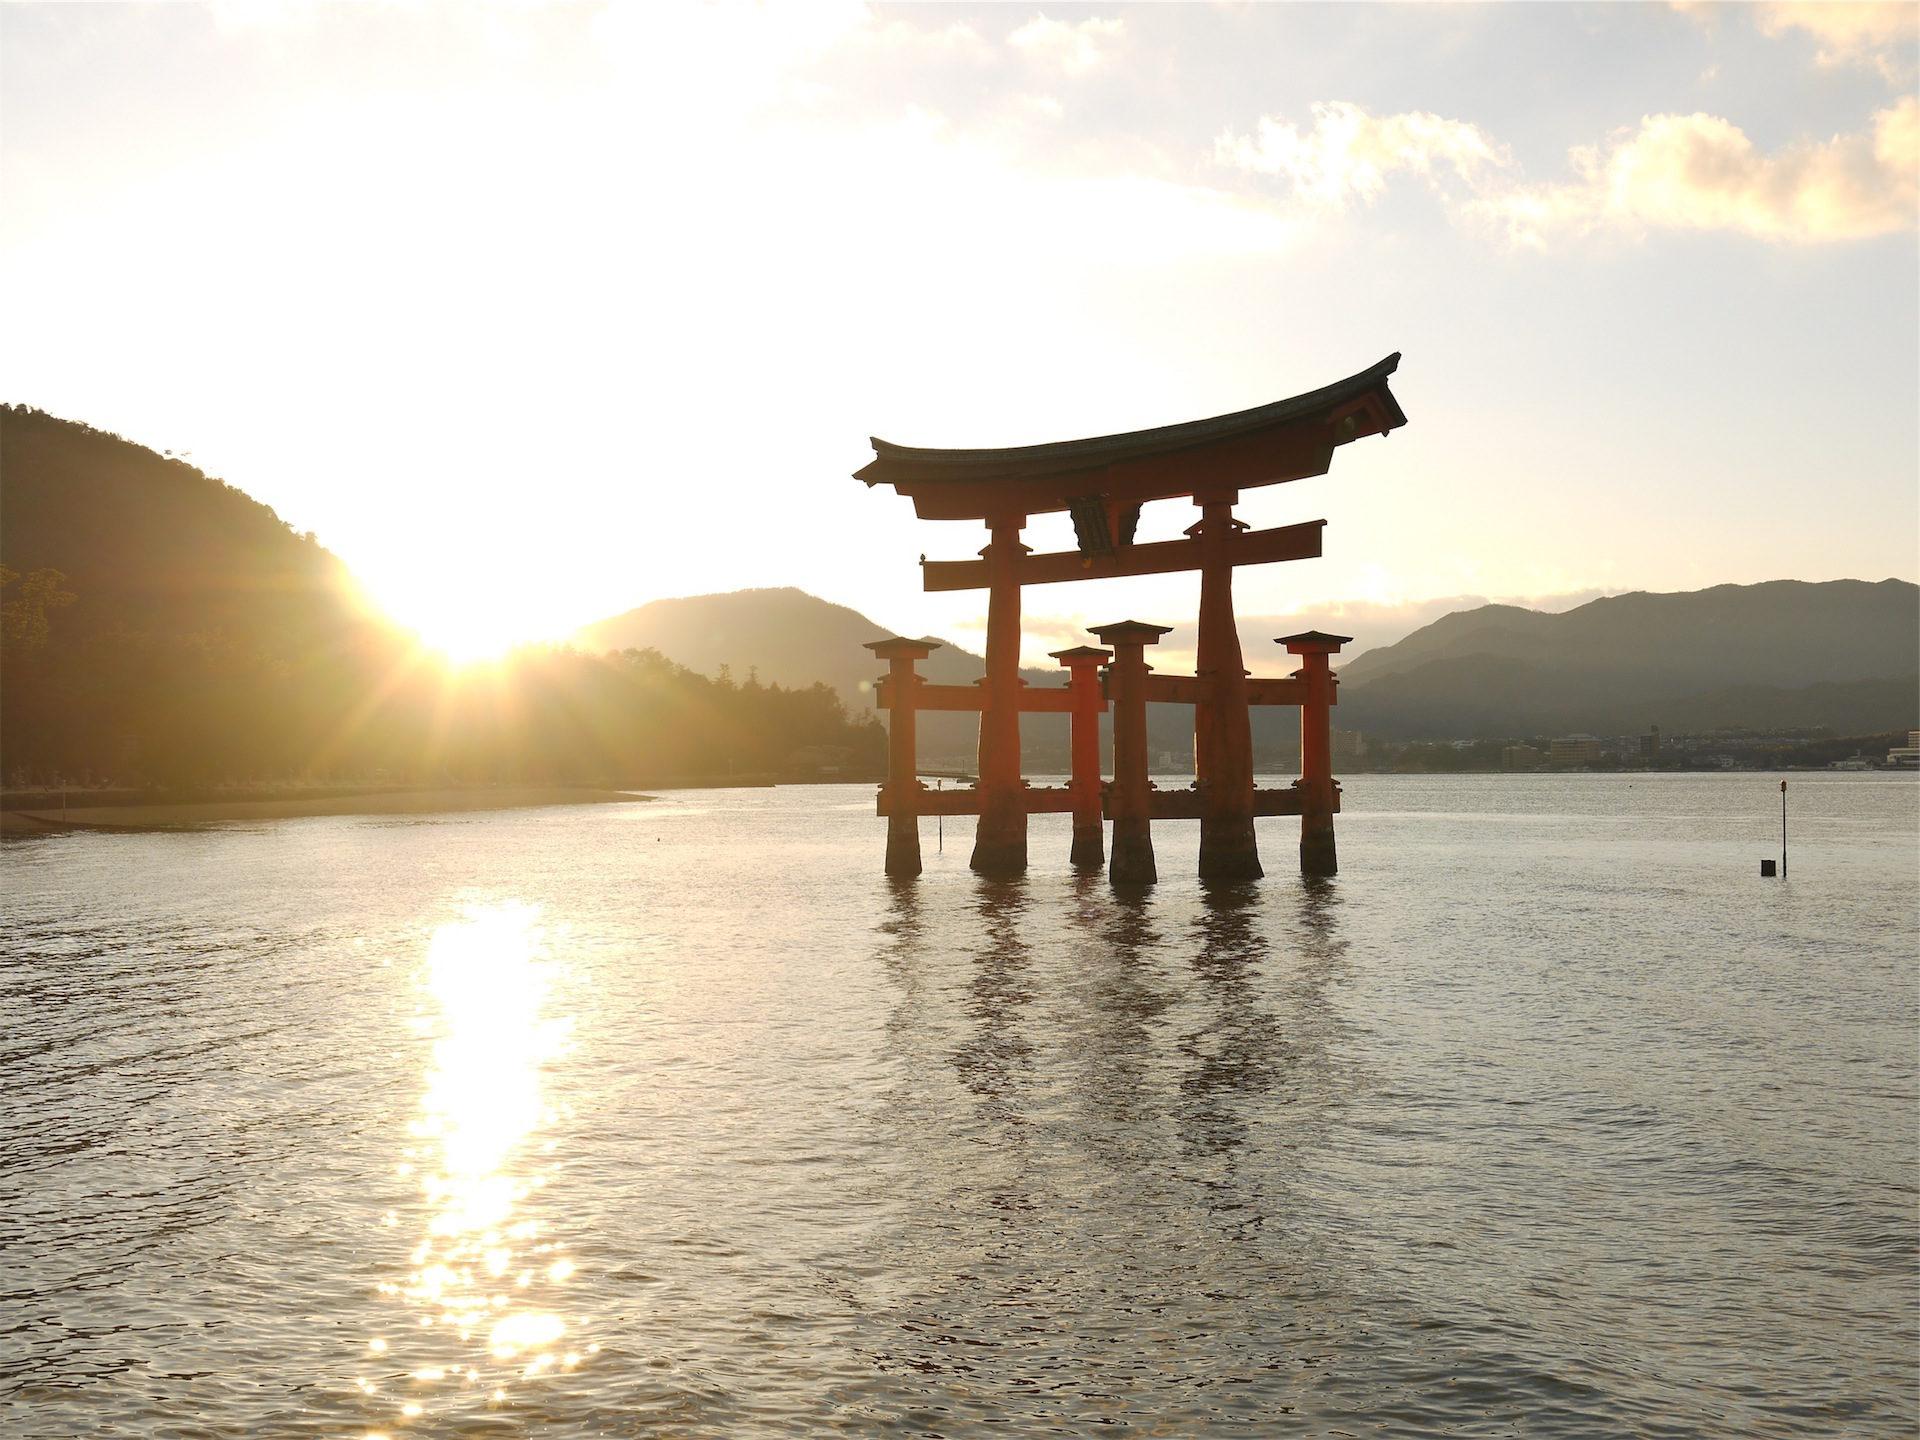 झील, मूर्तिकला, japón, सूर्य, naciente - HD वॉलपेपर - प्रोफेसर-falken.com